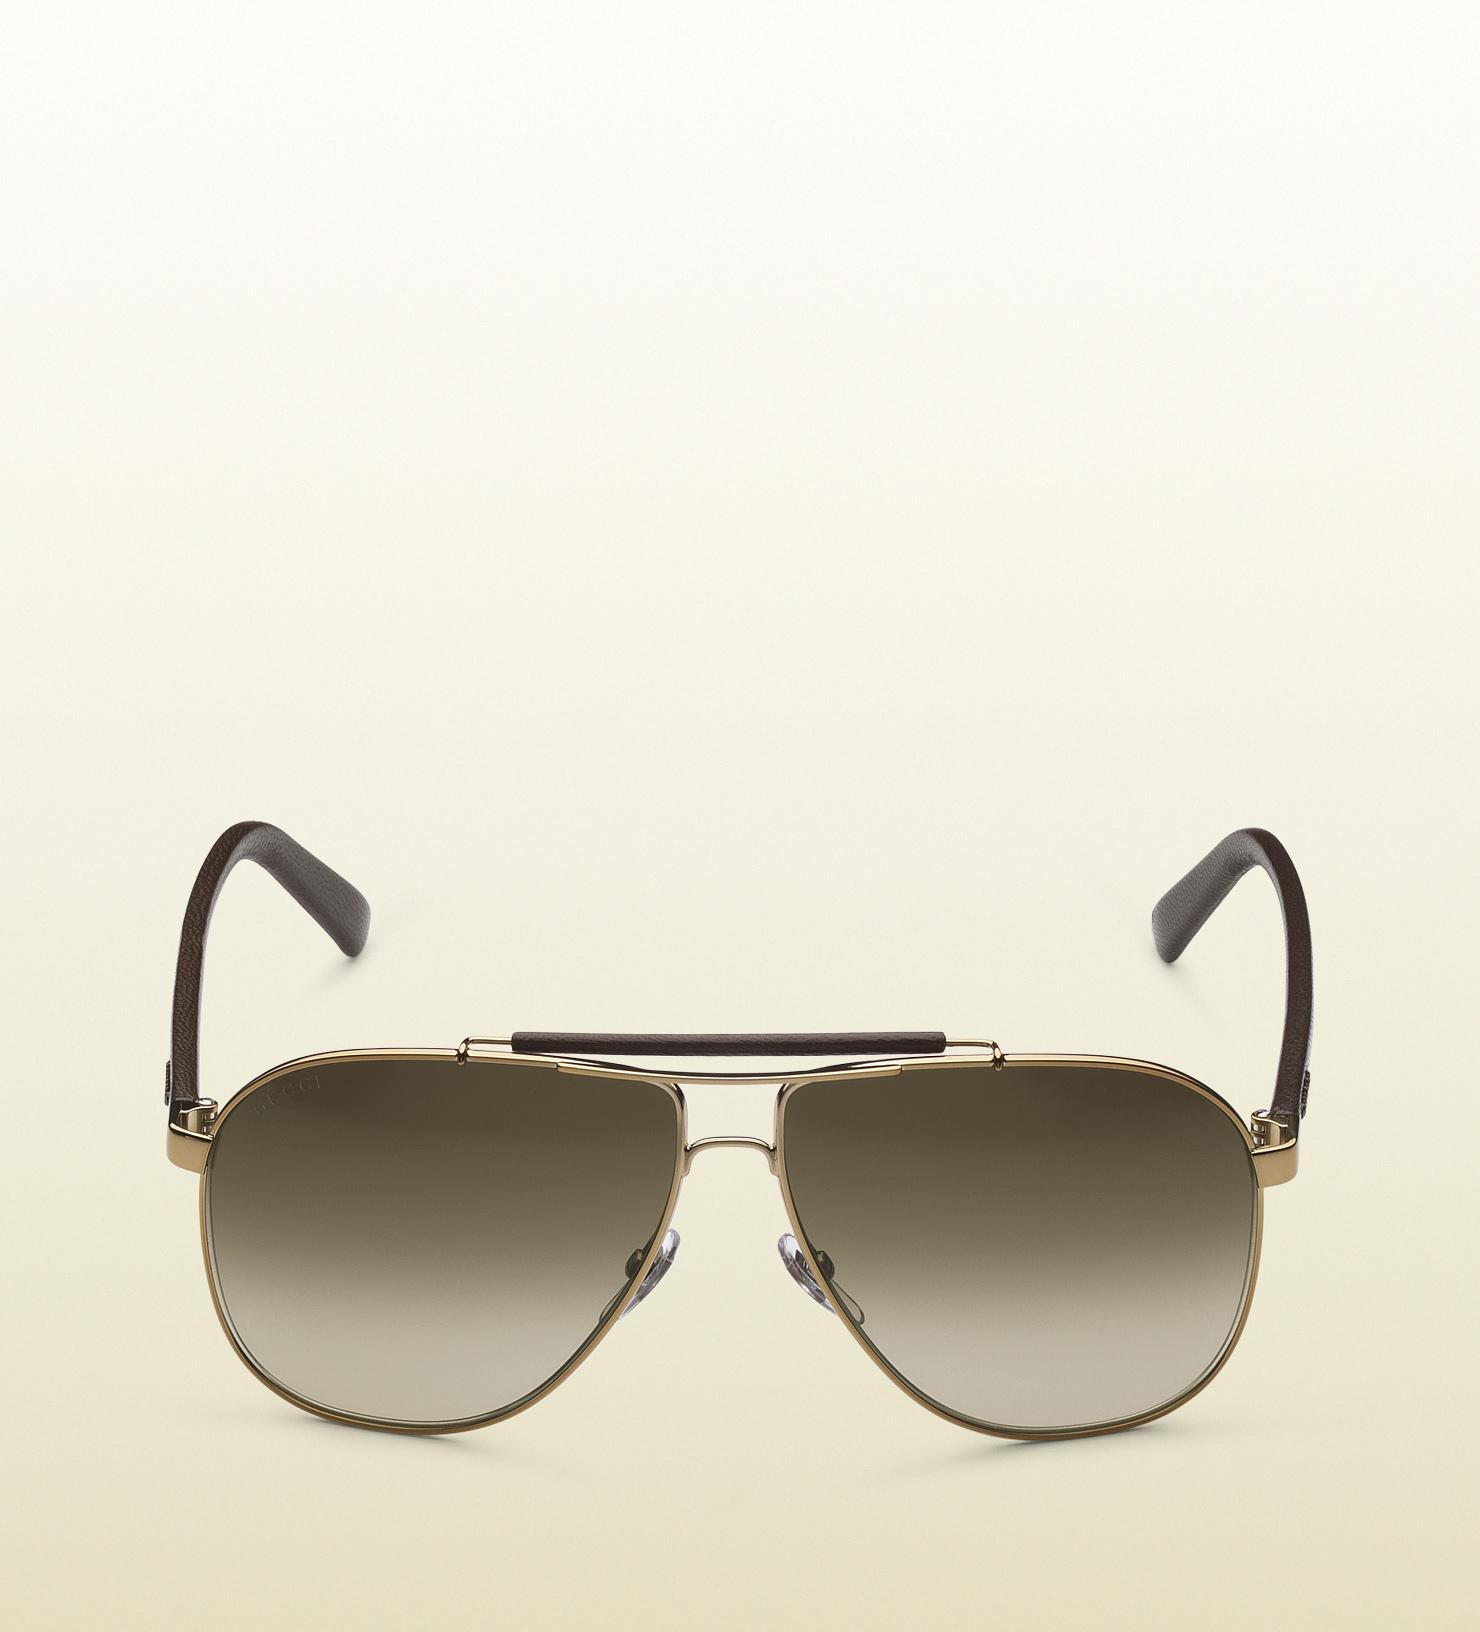 Gucci Sunglasses Leather Frame Aviator : Gucci Aviator Sunglasses with Leather Brow Bar and Temples ...